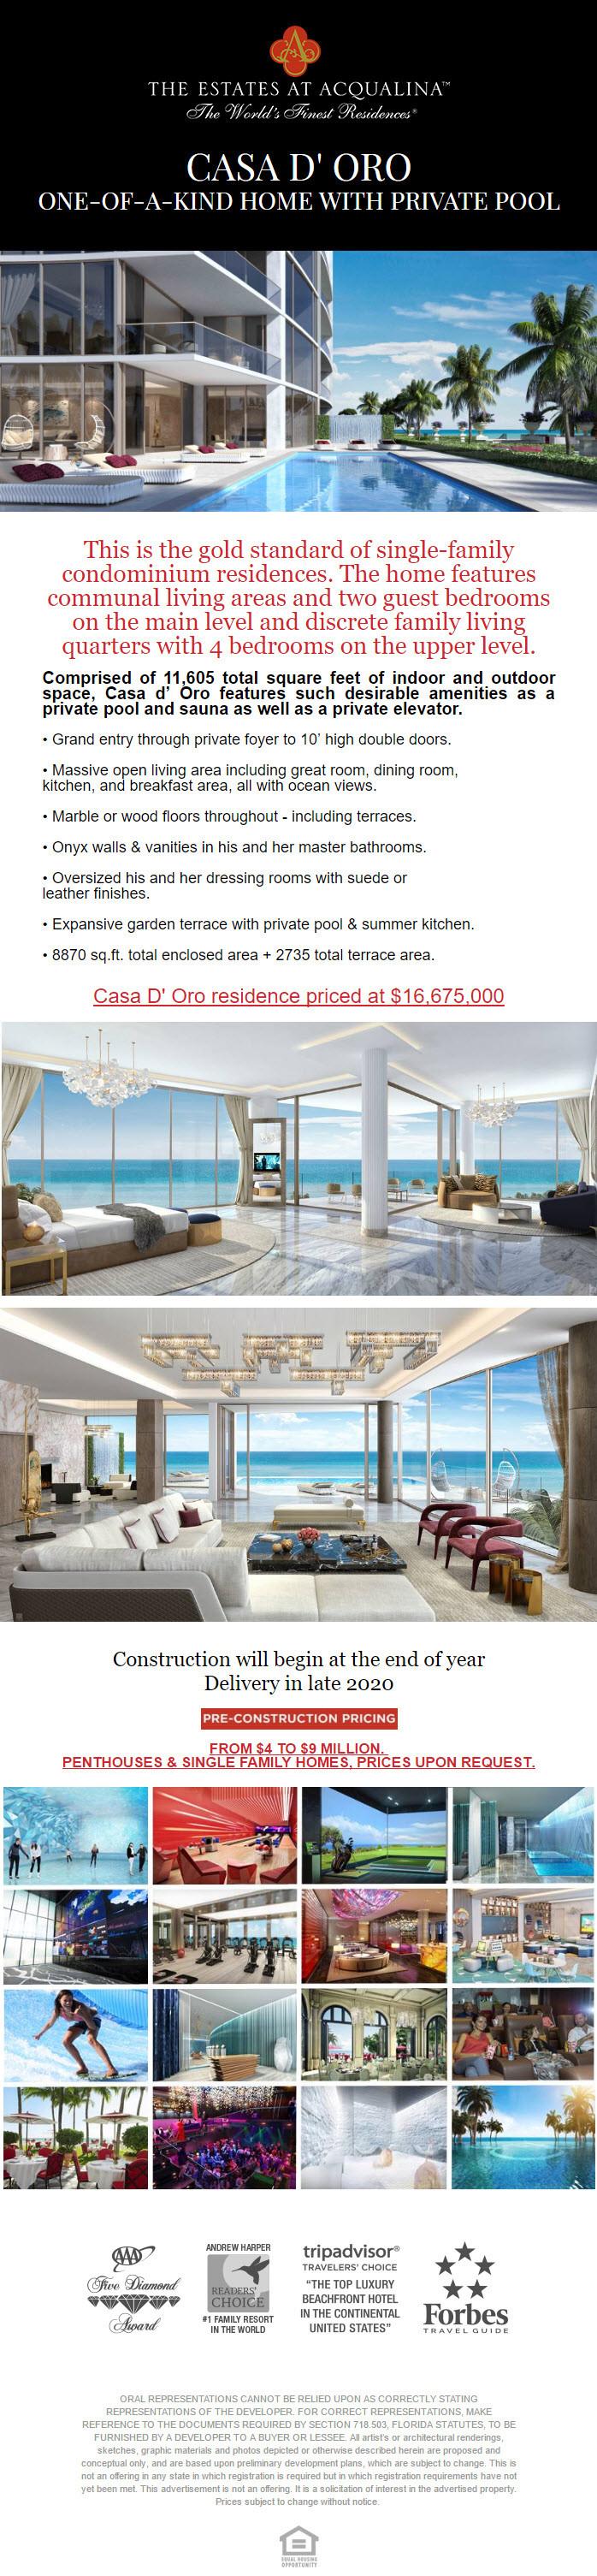 The Estates At Acqualina - Casa D' Oro